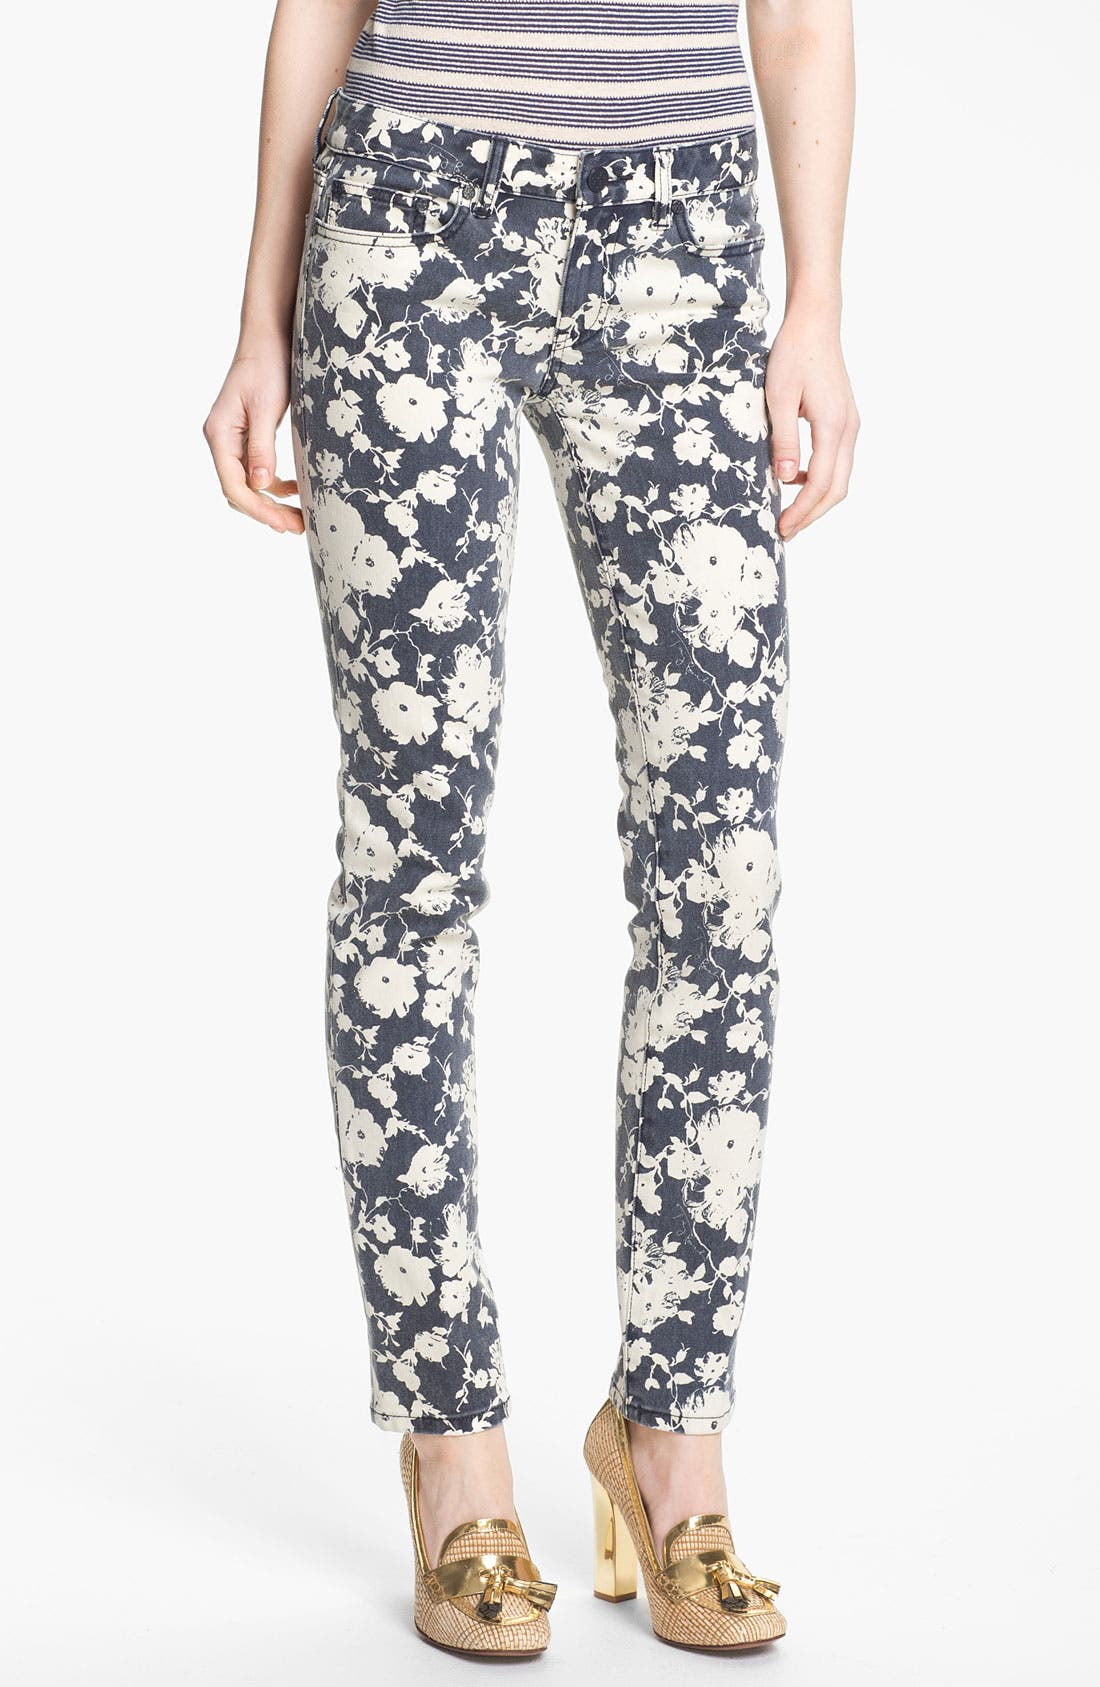 Alternate Image 1 Selected - Tory Burch 'Alexa' Print Skinny Jeans (Tory Navy Abbott)